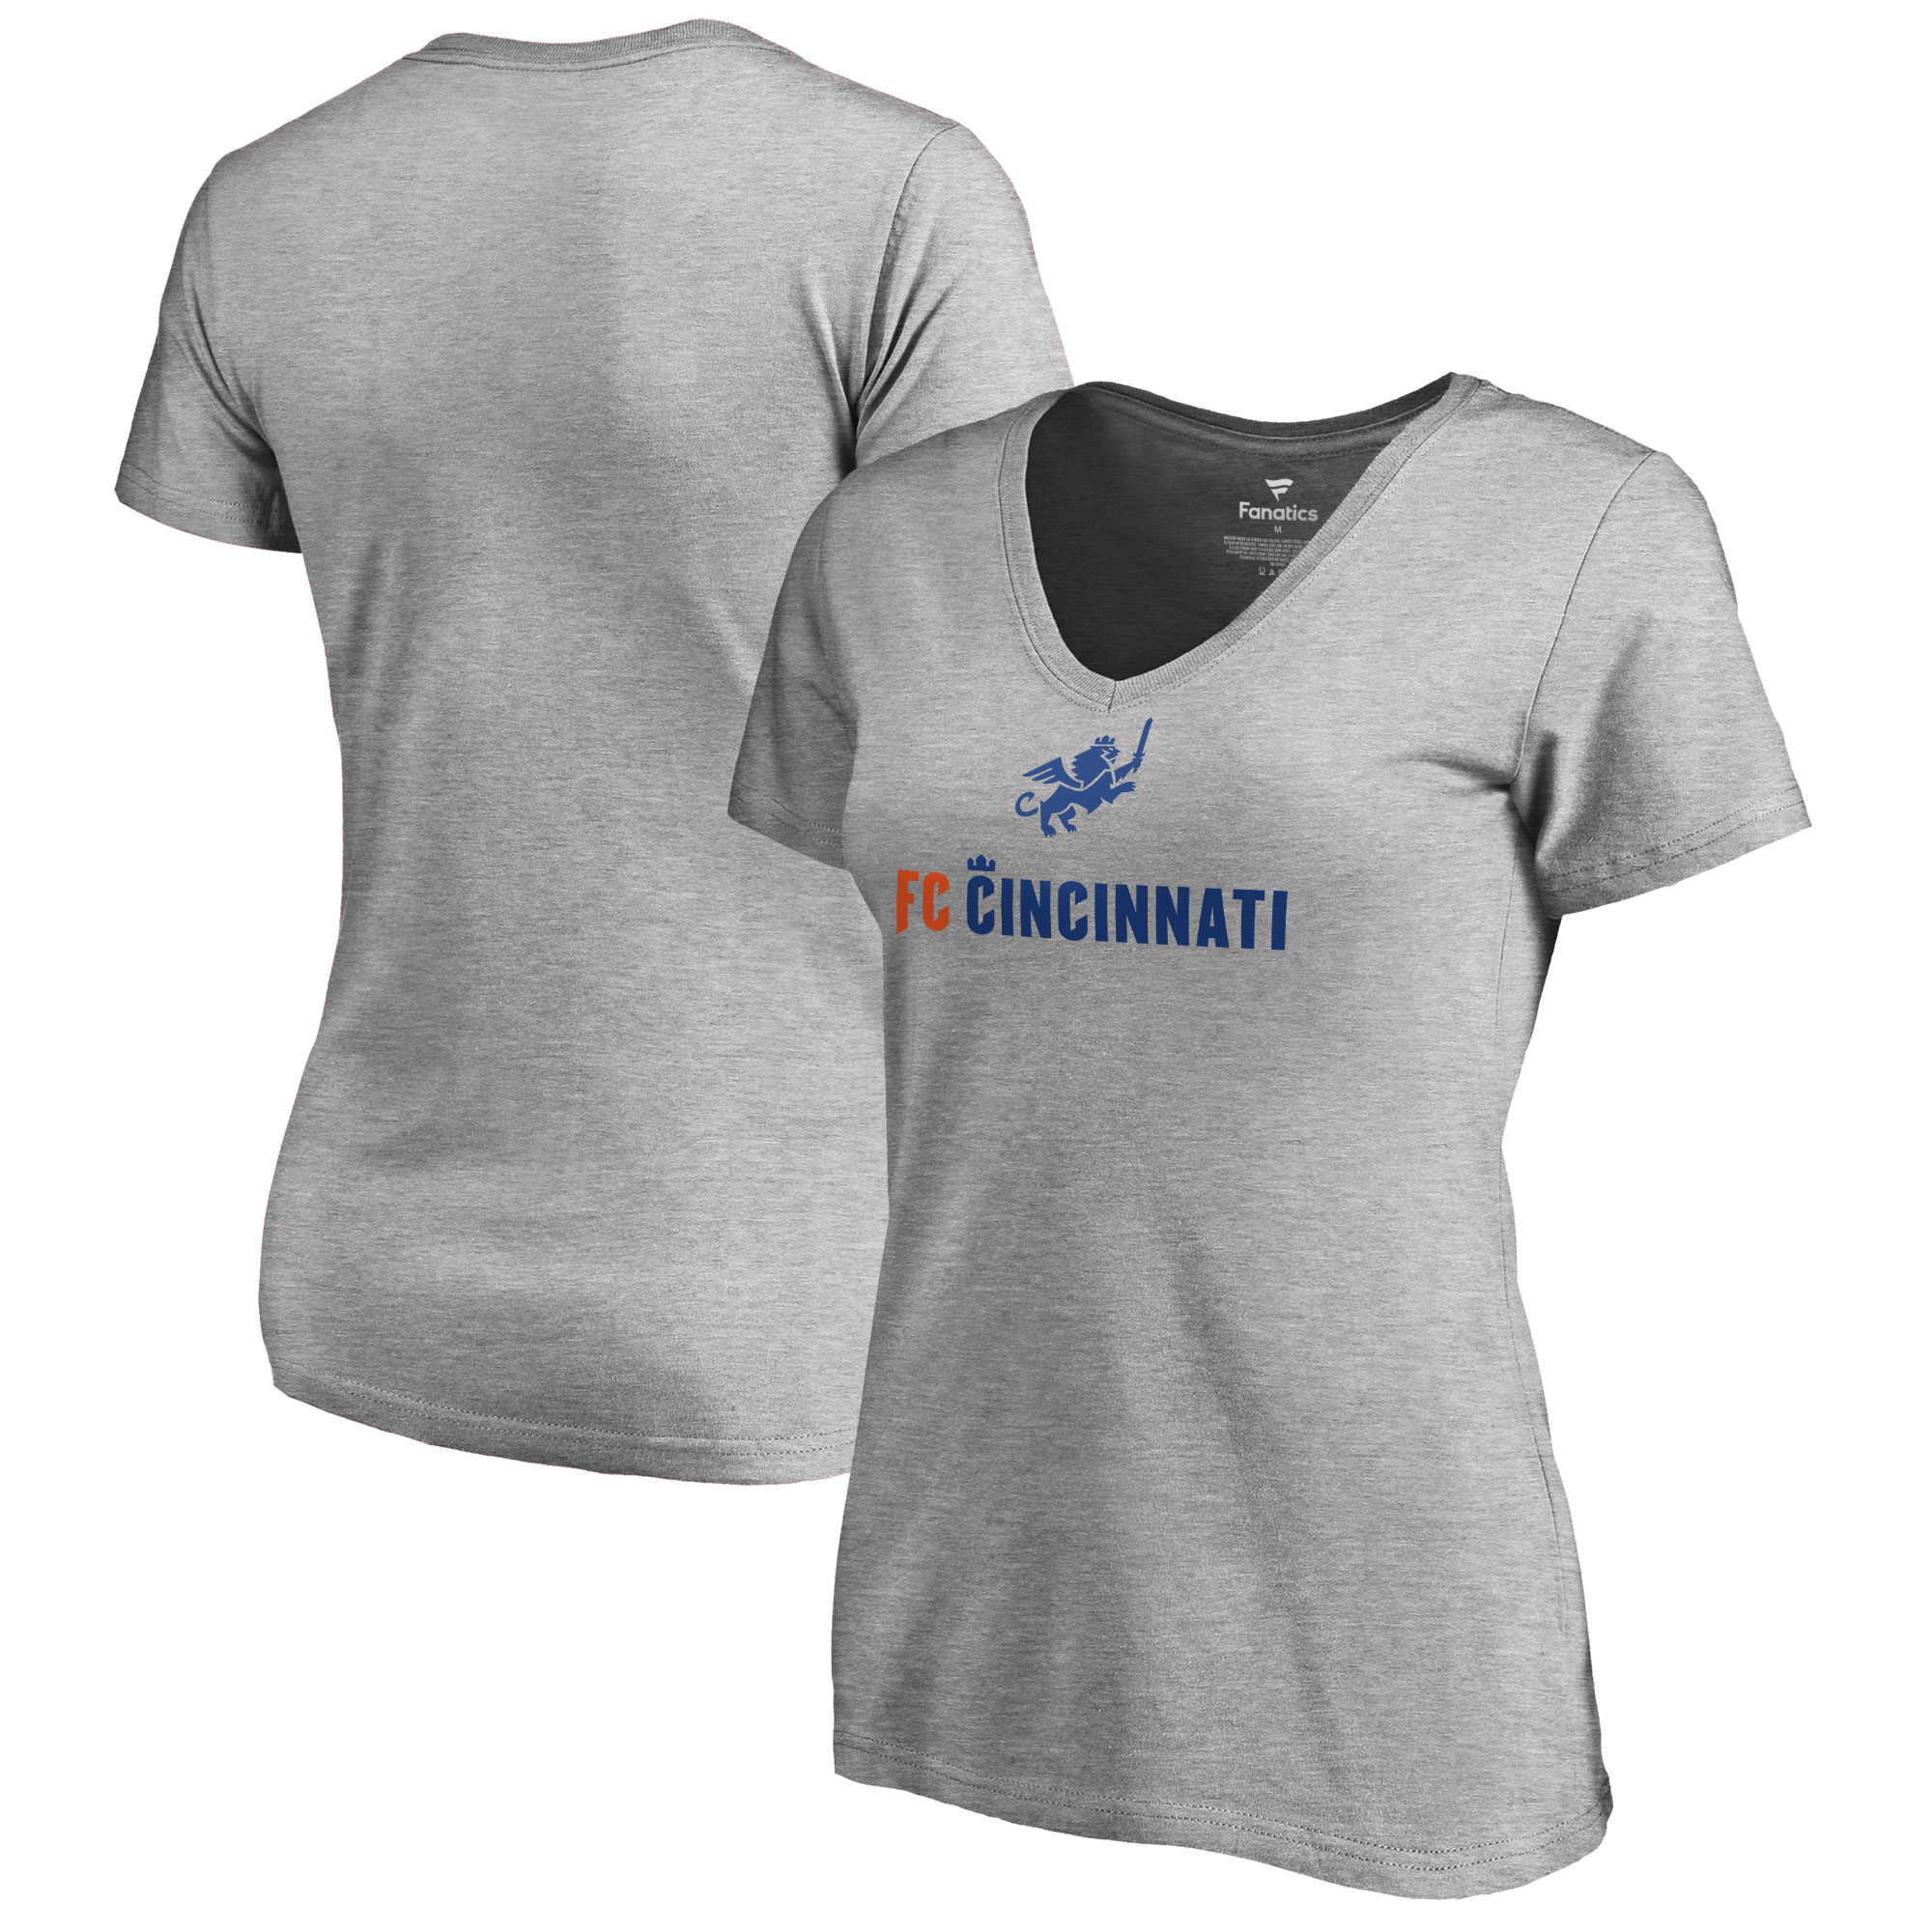 FC Cincinnati Fanatics Branded Women's Victory Arch V-Neck T-Shirt - Heather Gray